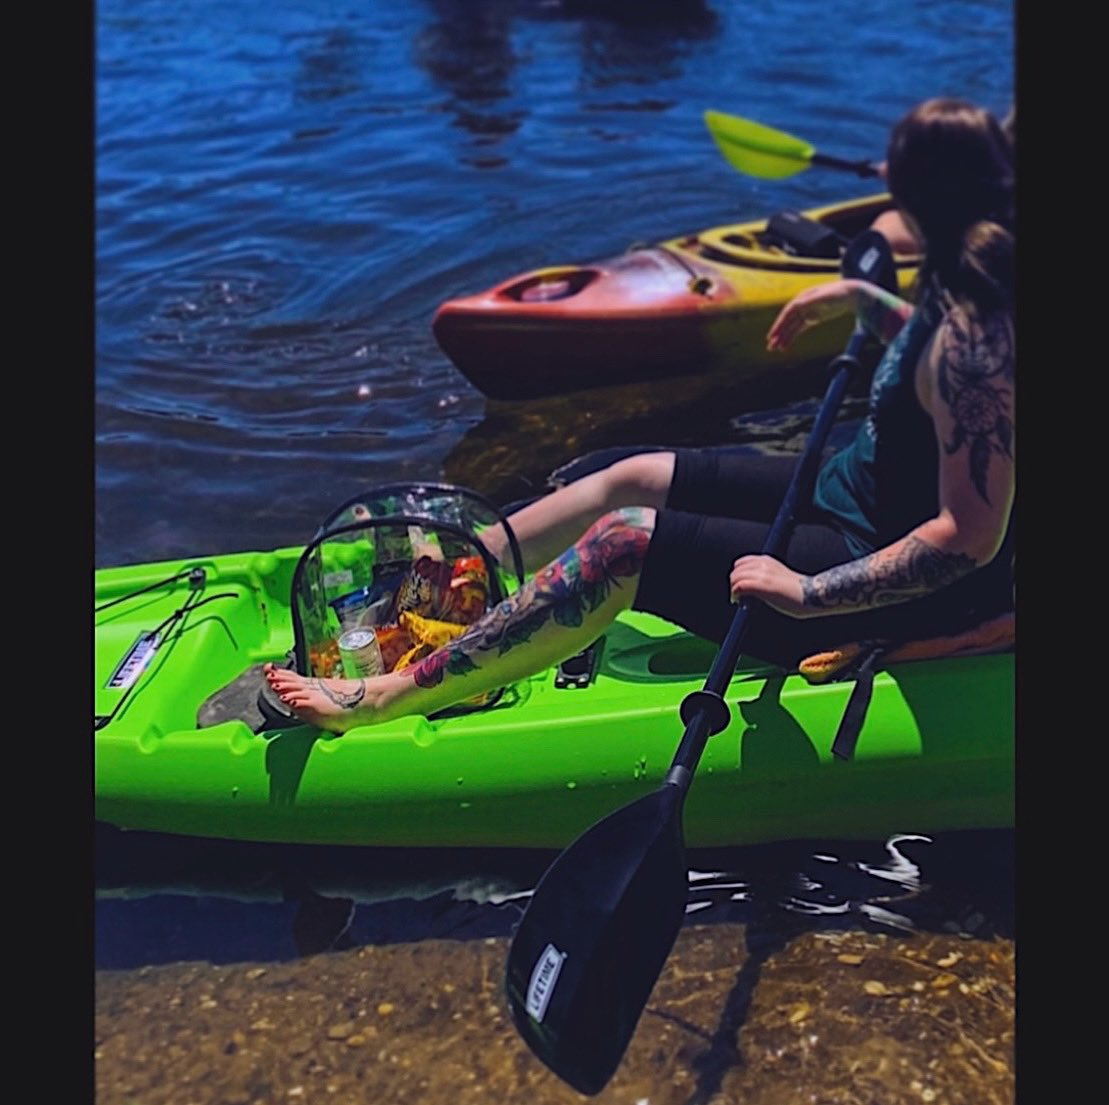 I miss kayaking 😓🛶 #igotallthesnacks #lake #kayak #summer